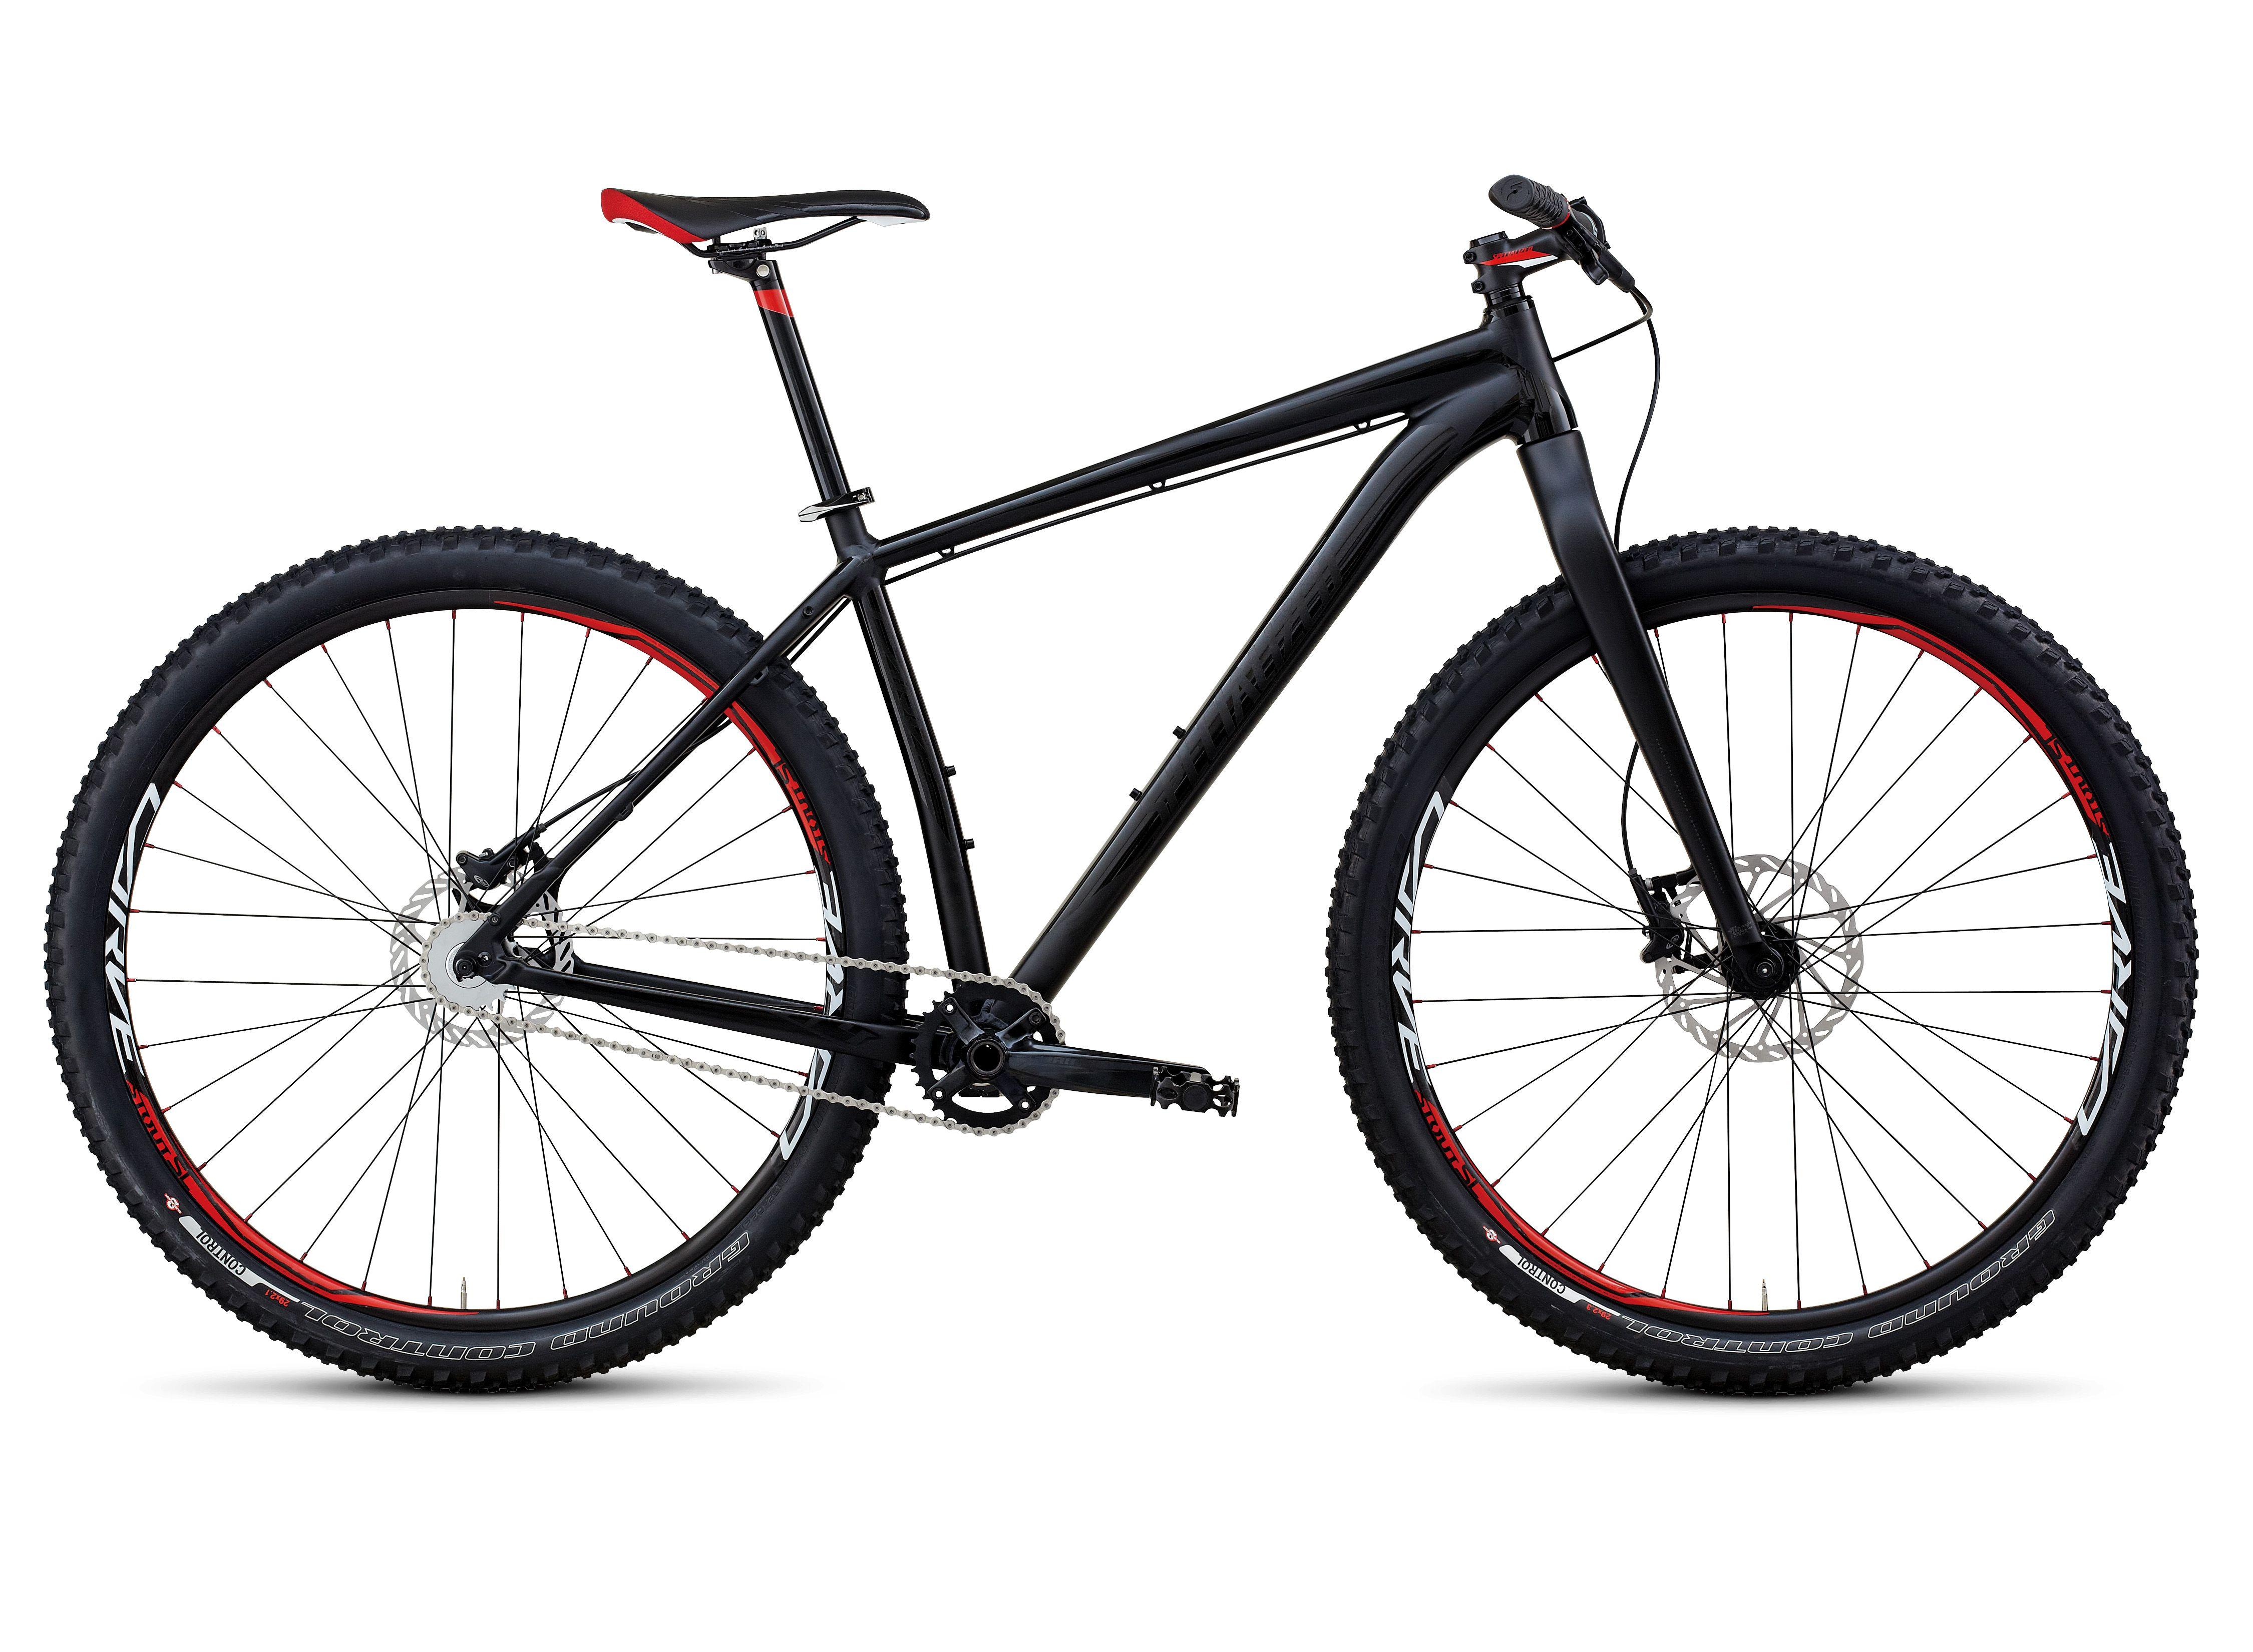 Specialized Single Speed MTB | Hardtail mountain bike, Mtb